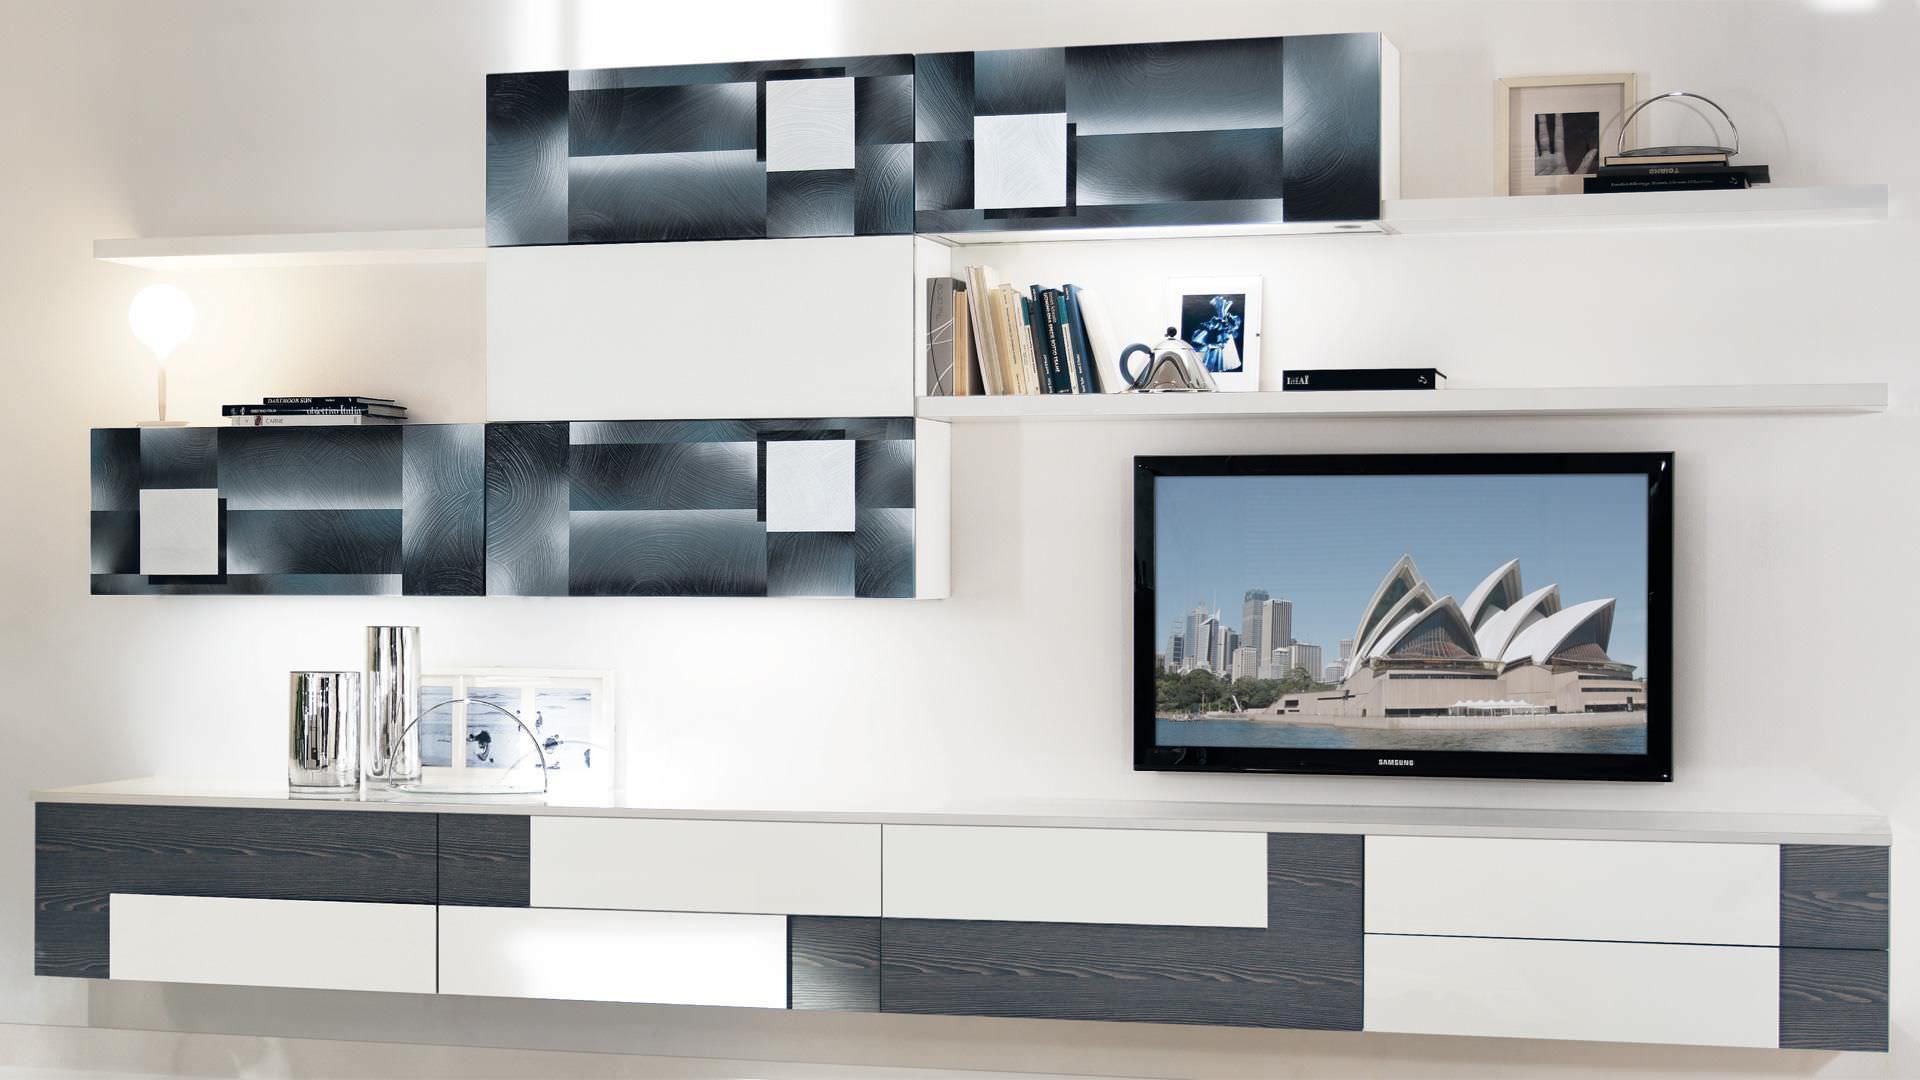 Moderne Wohnwand / Holz - CREATIVA - CUCINE LUBE - Videos